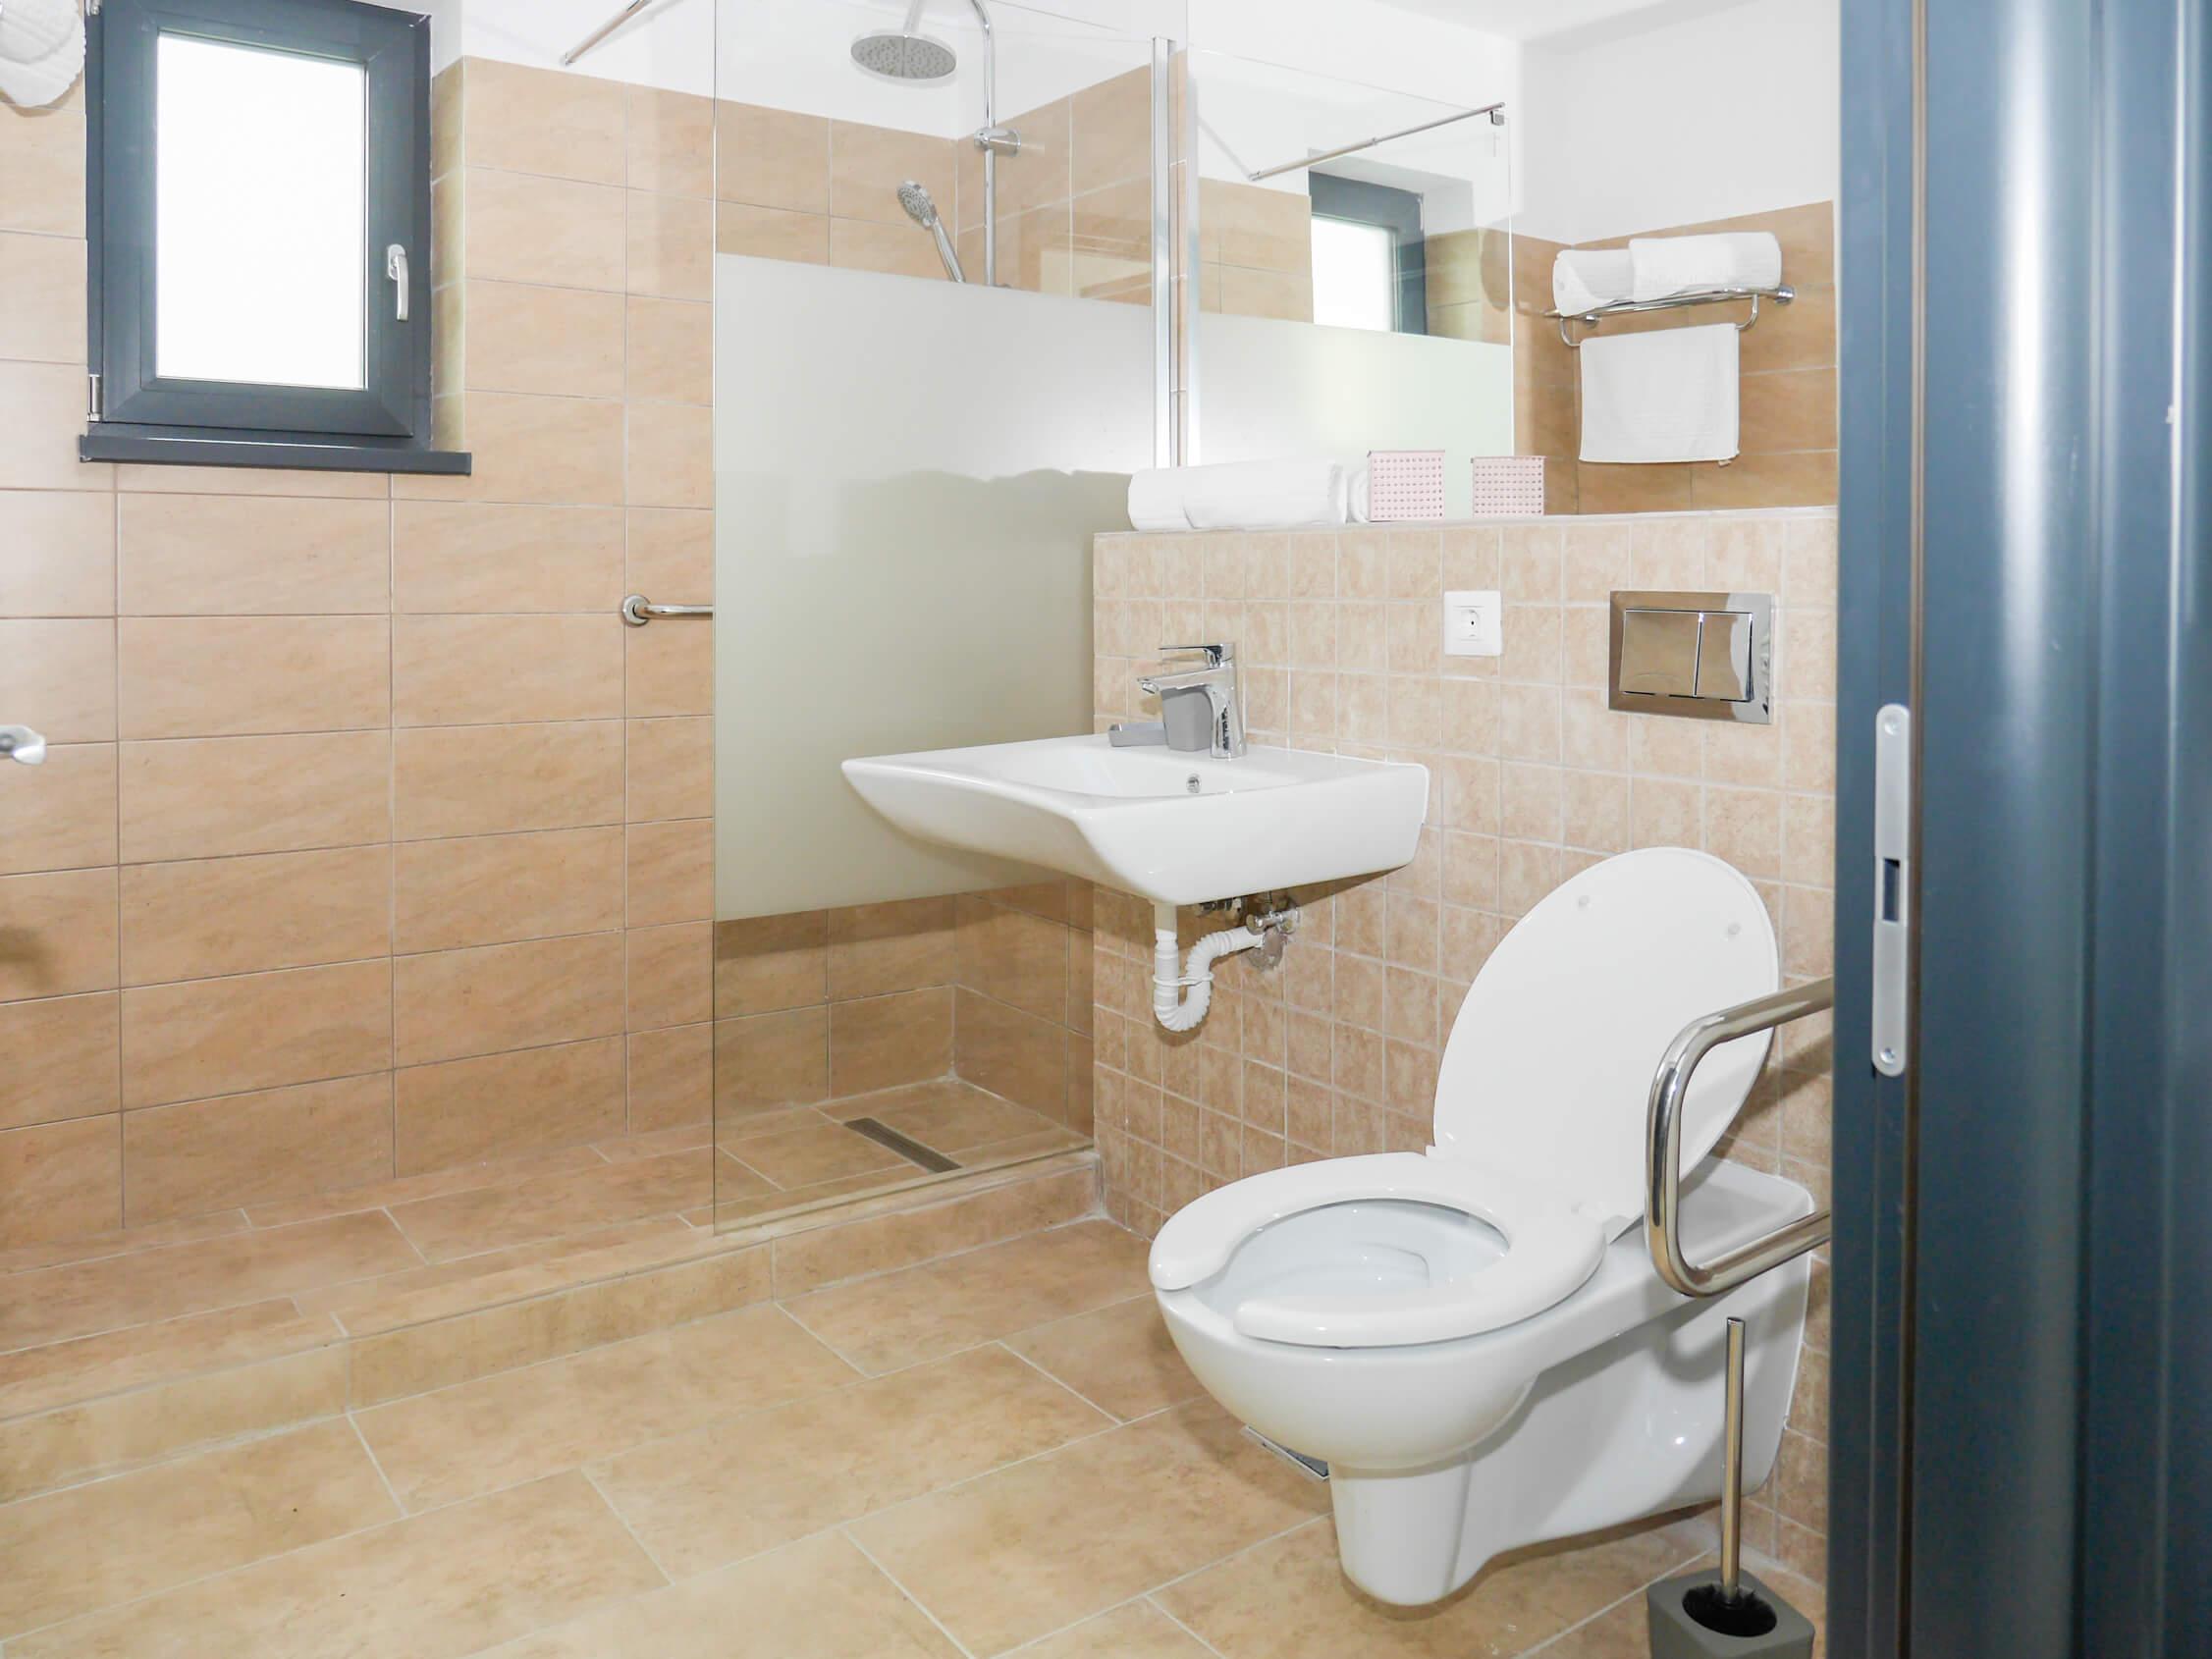 Clement Apartments - apartamente de inchiriat in regim hotelier - cazare neamt - cazare piatra neamt (1)